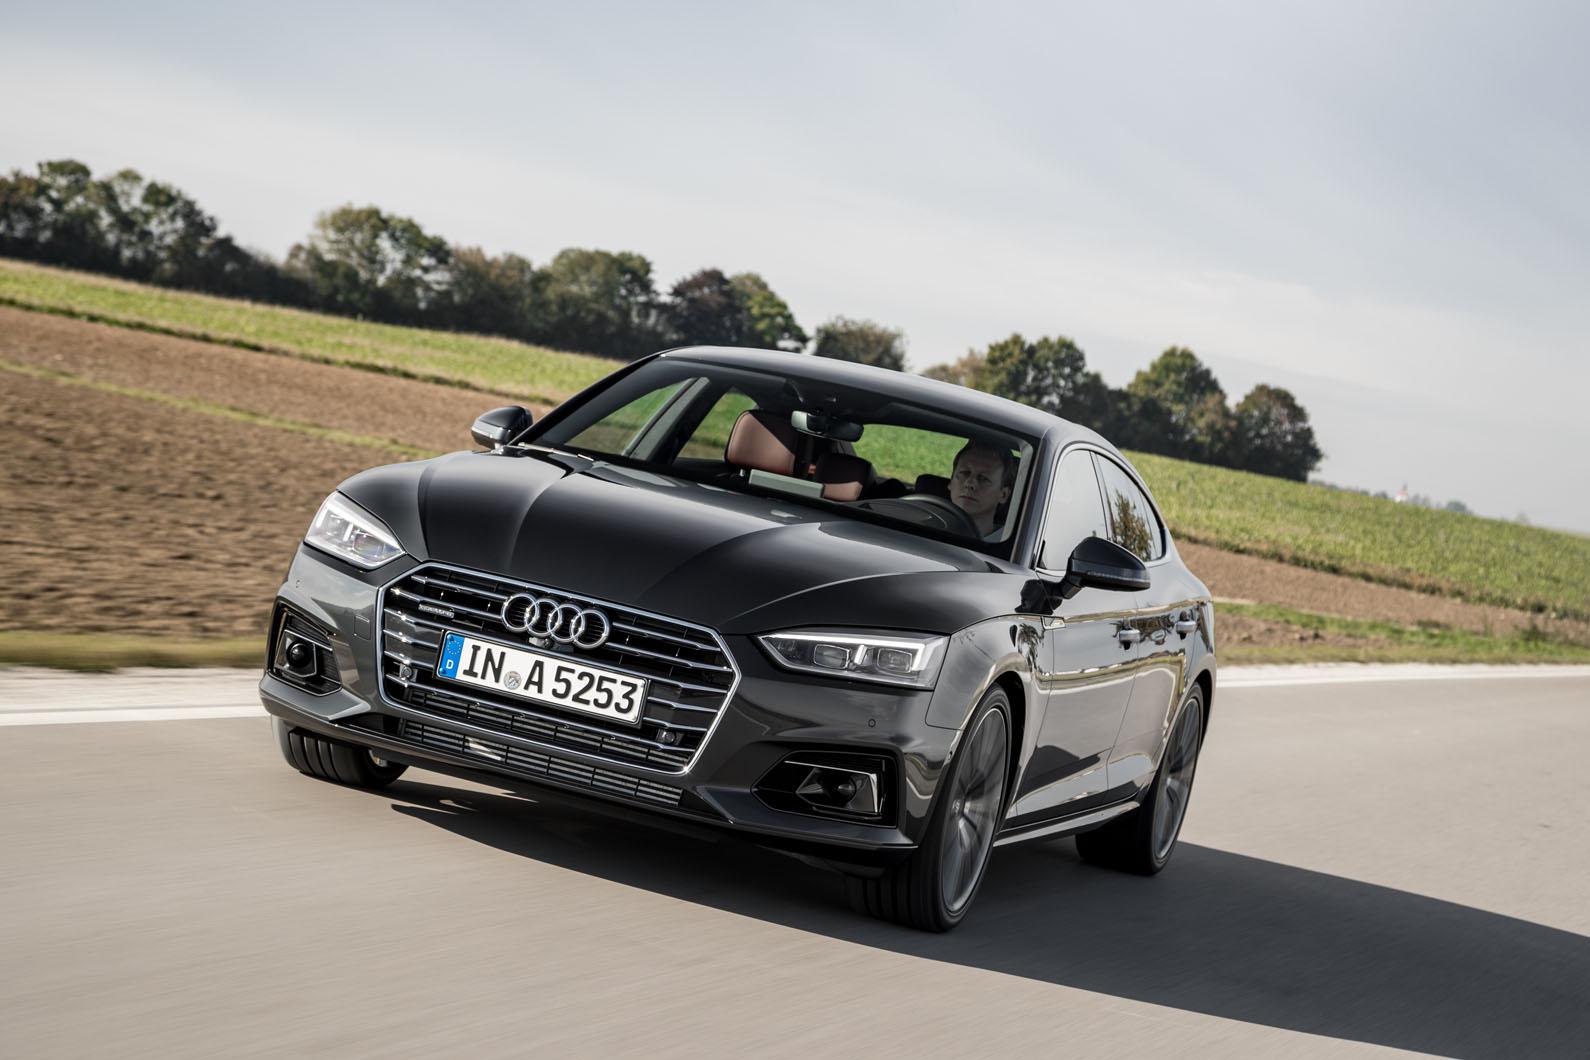 2017 audi a5 sportback 3 0 tdi 286 quattro s line review review autocar